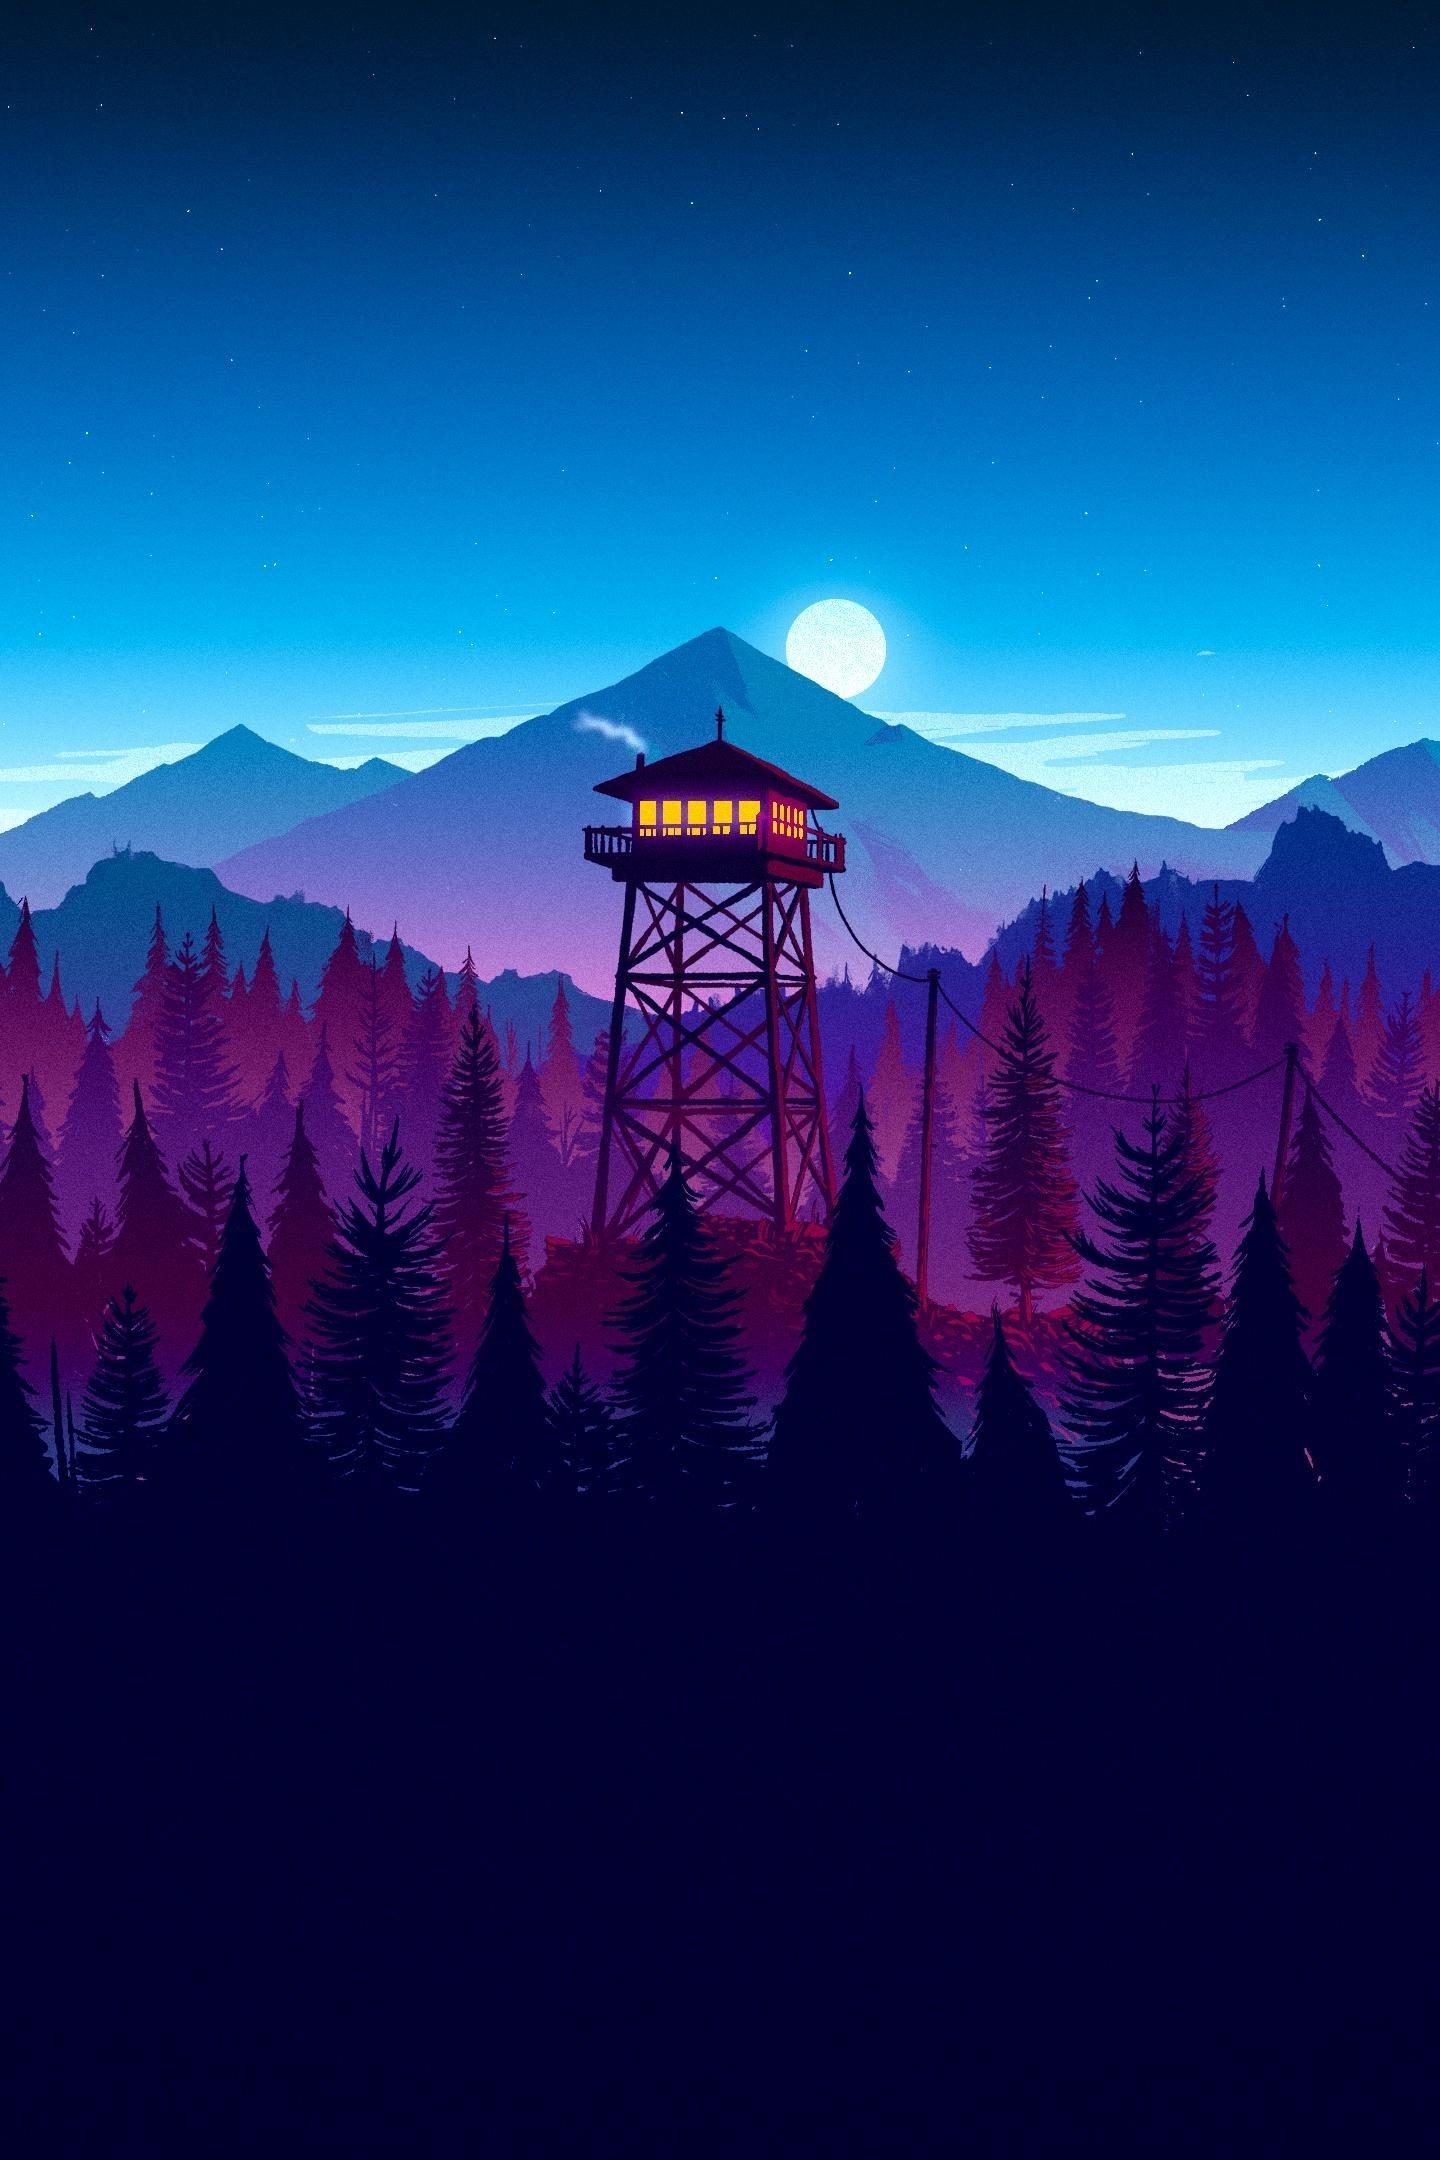 Download 1440x2960 Wallpaper Firewatch Video Game Sunset Artwork